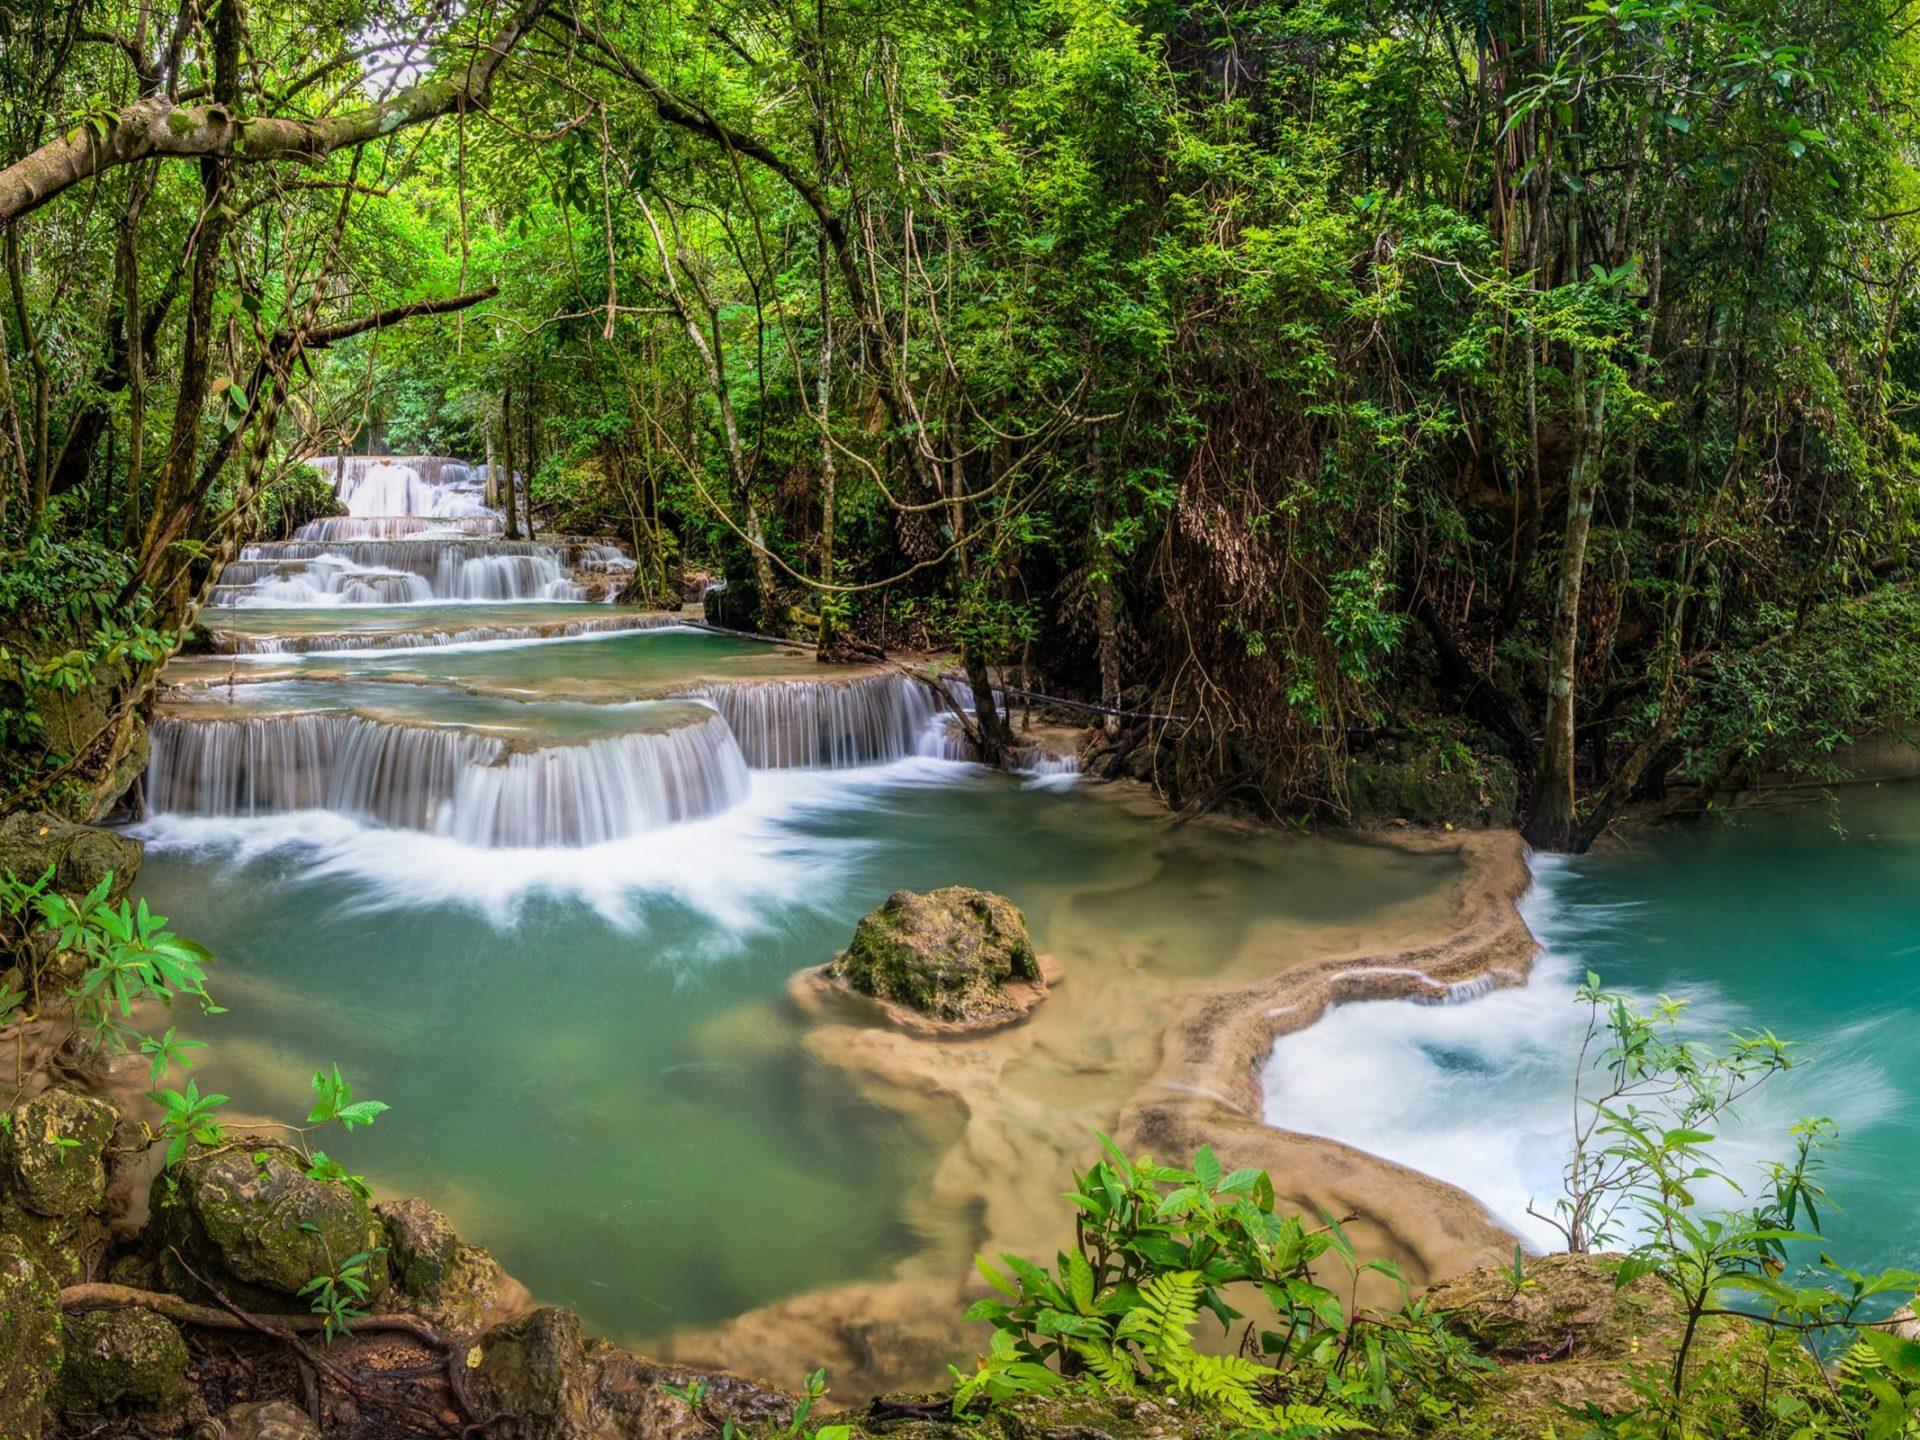 Waterfalls Desktop Wallpaper Forest Falls Waterfall Kanjanaburi Thailand River Jungle Forest